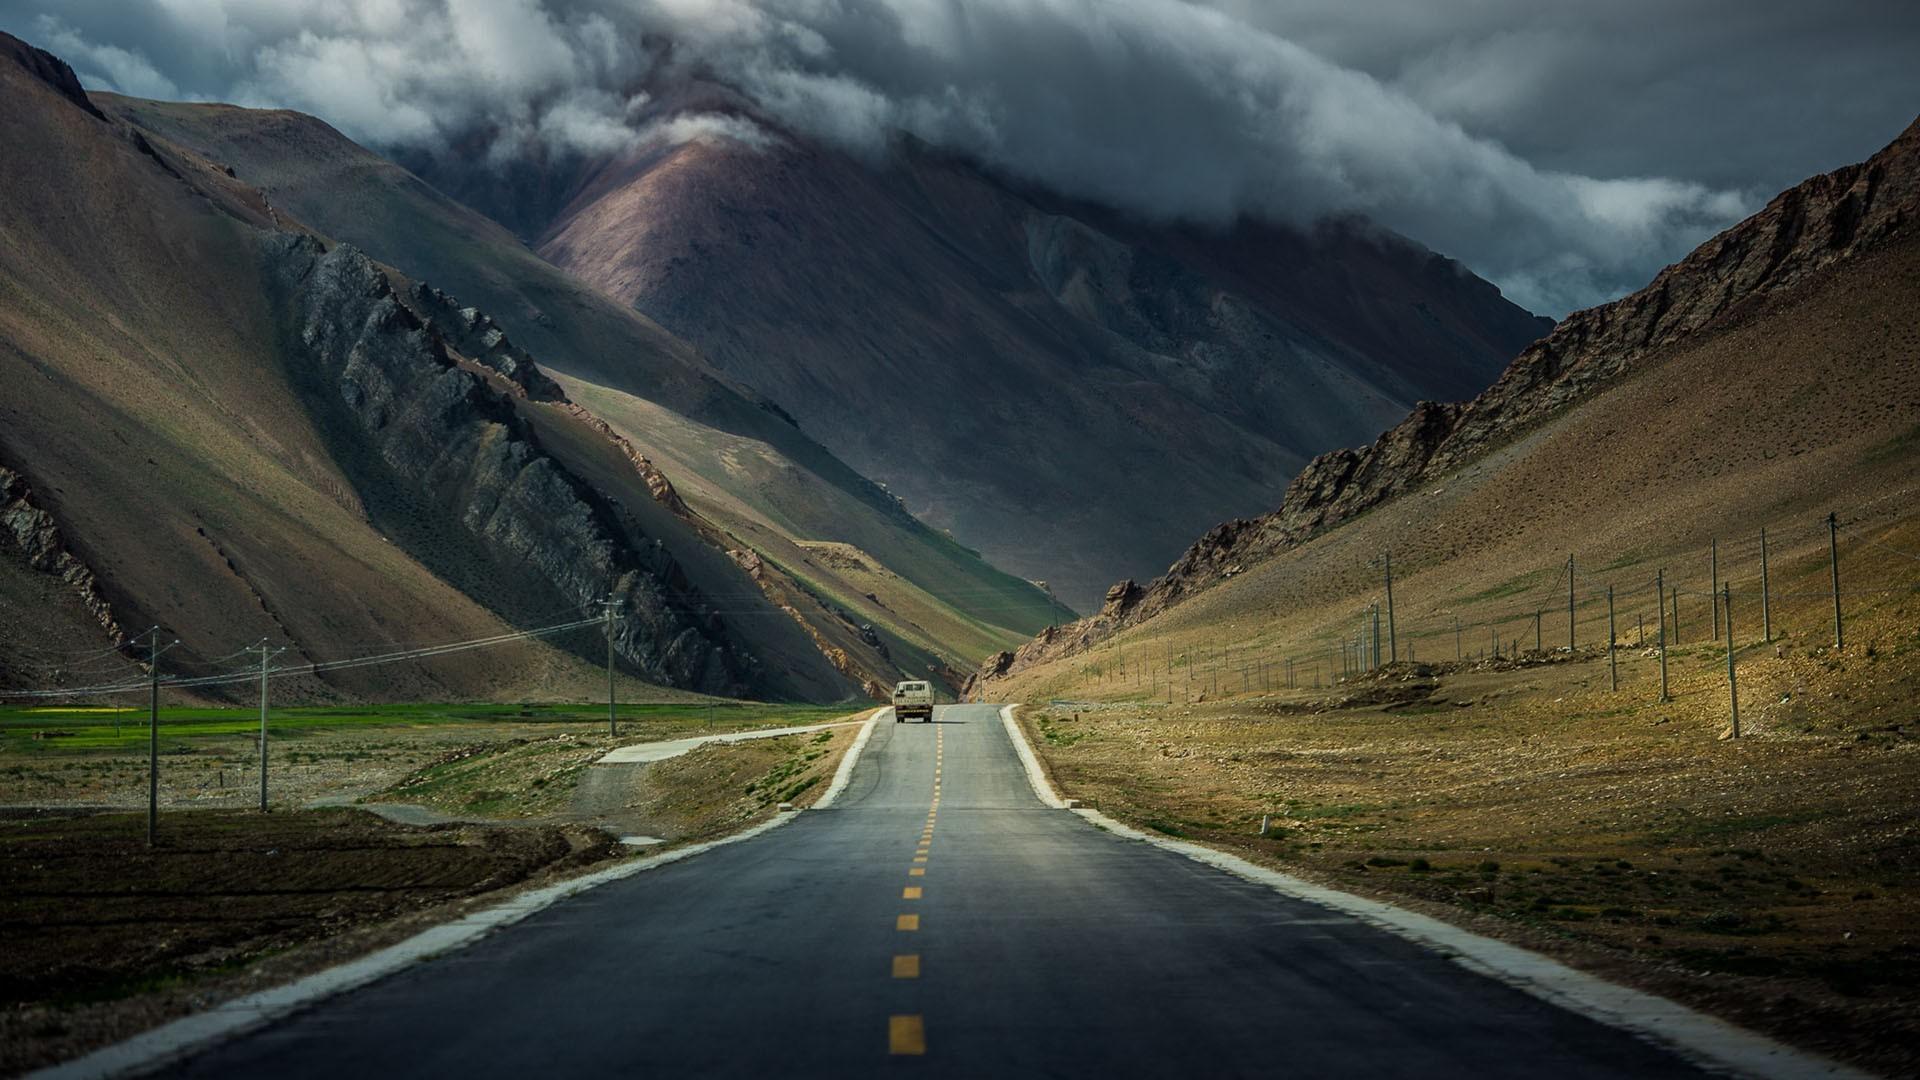 Tibet road photo